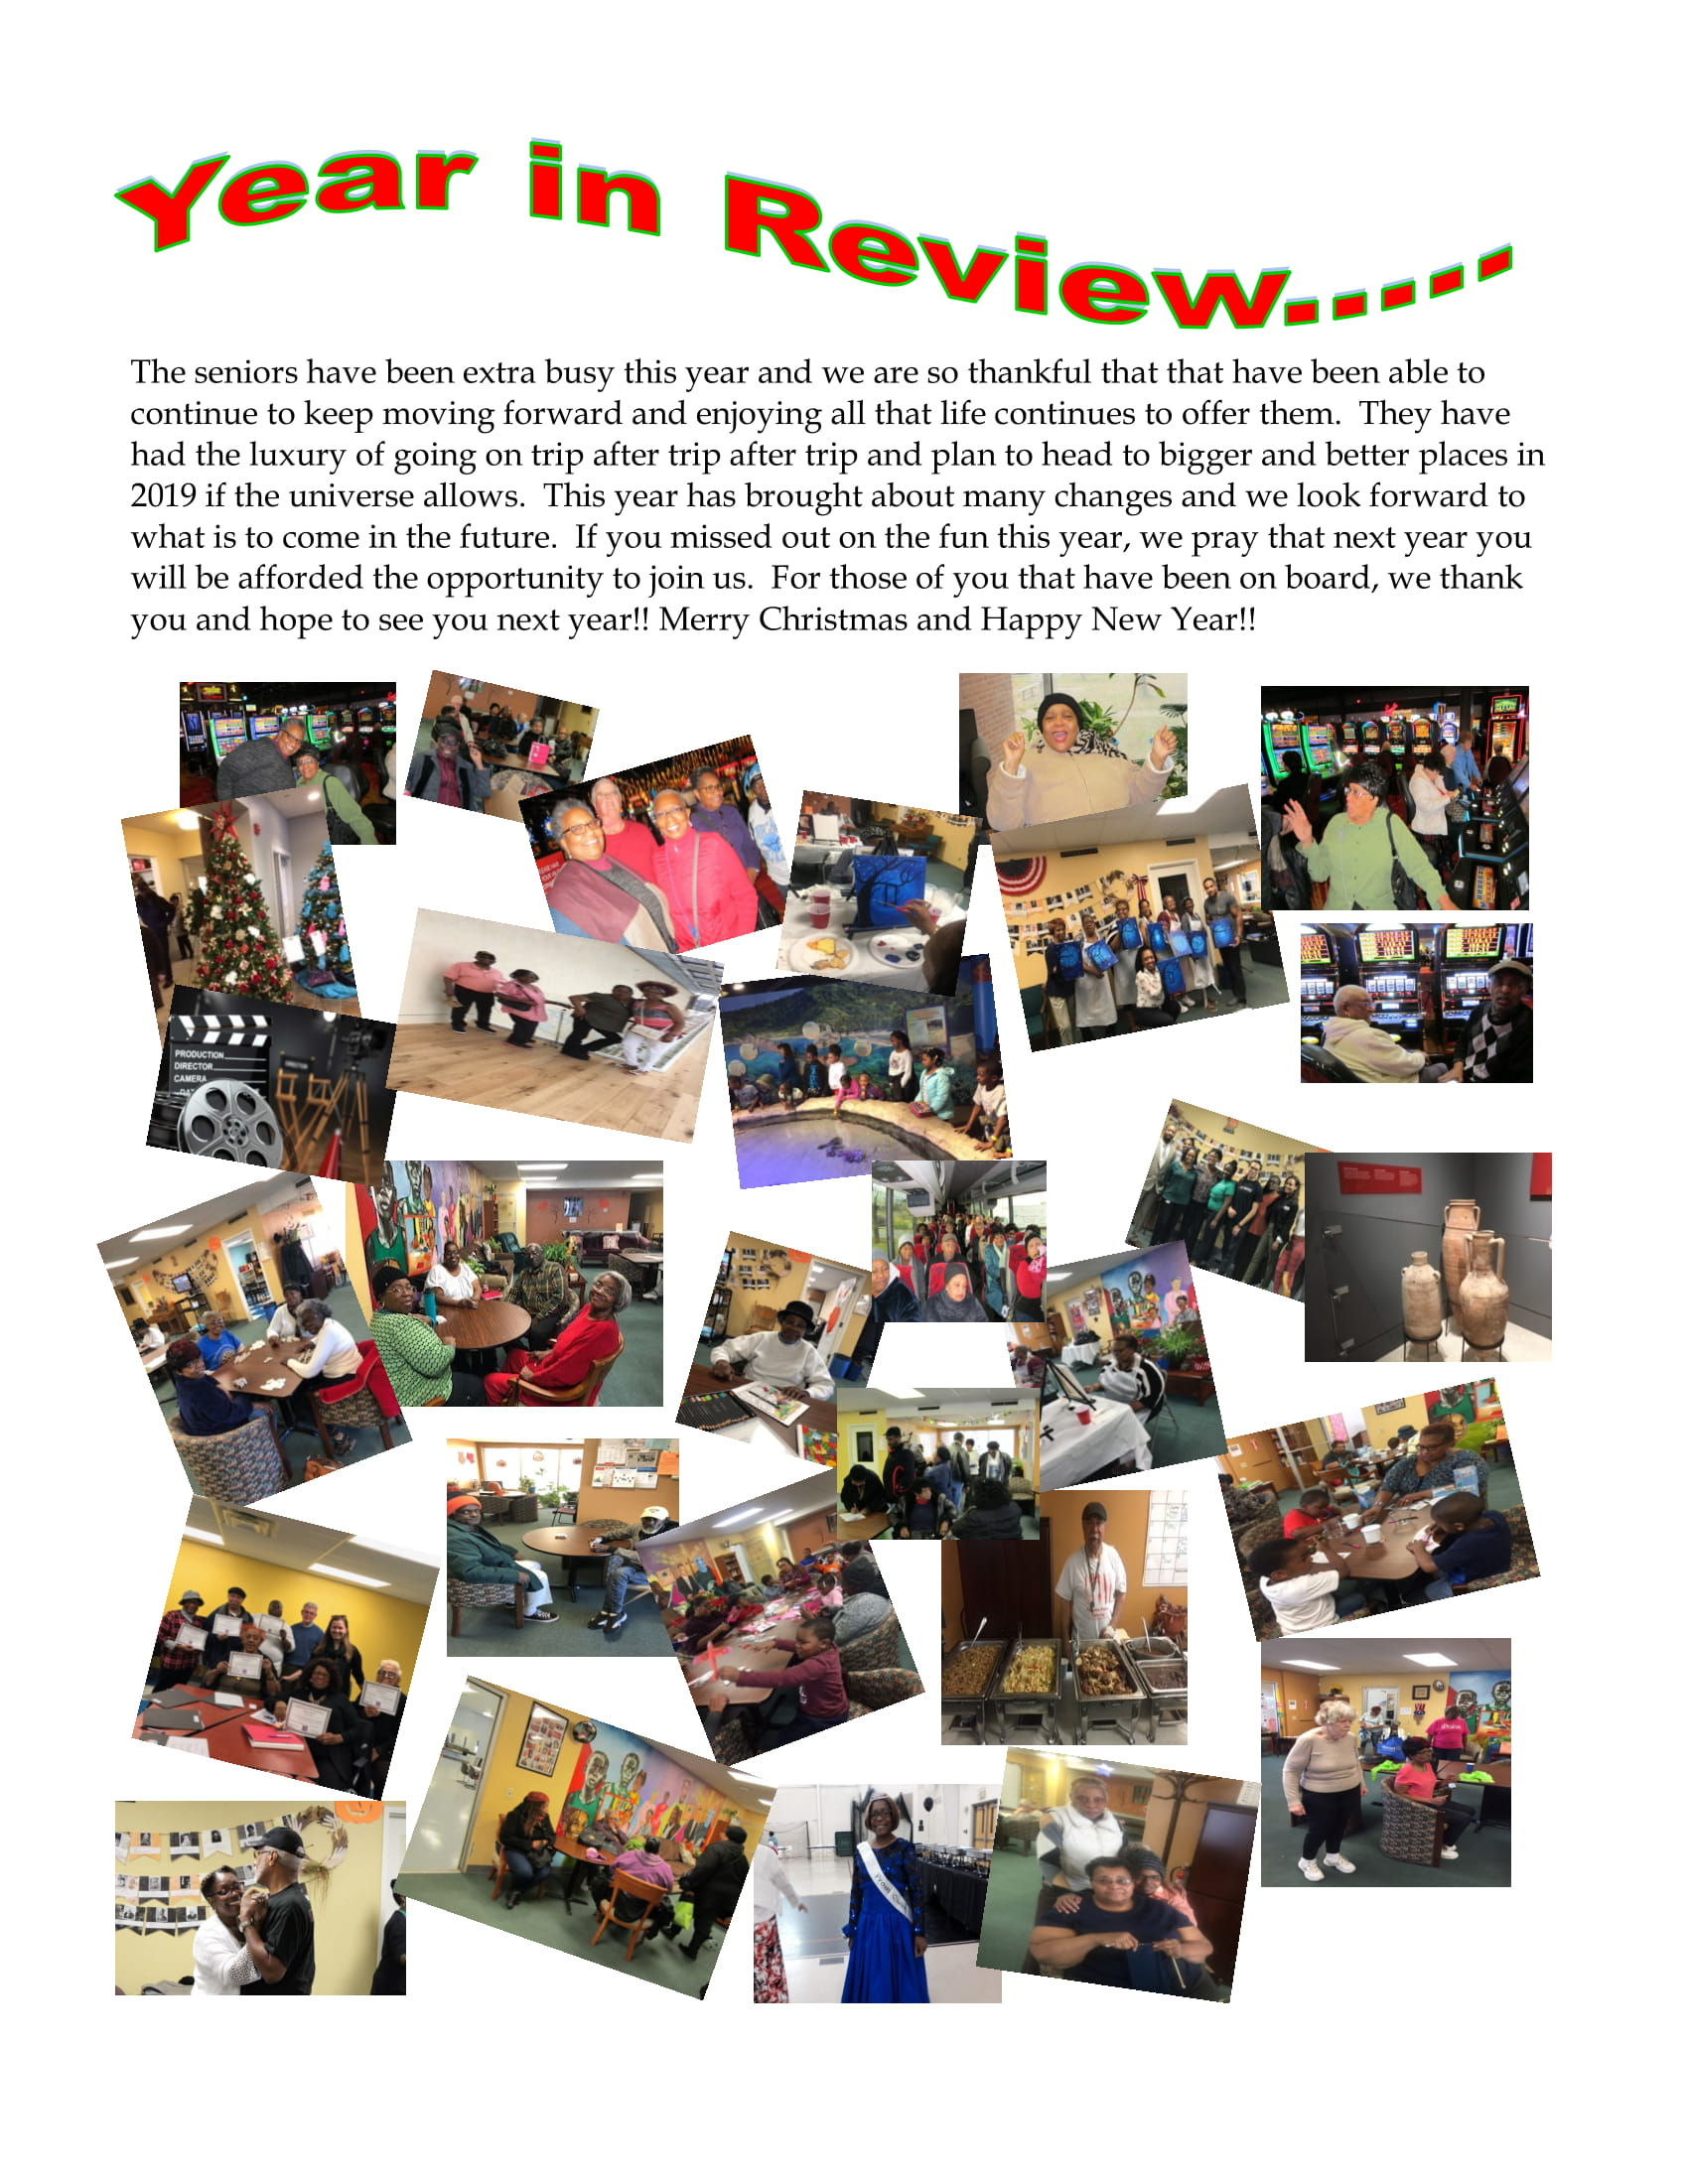 KCC December Newsletter 2018 updated 12.10.18_Part2-1.jpg